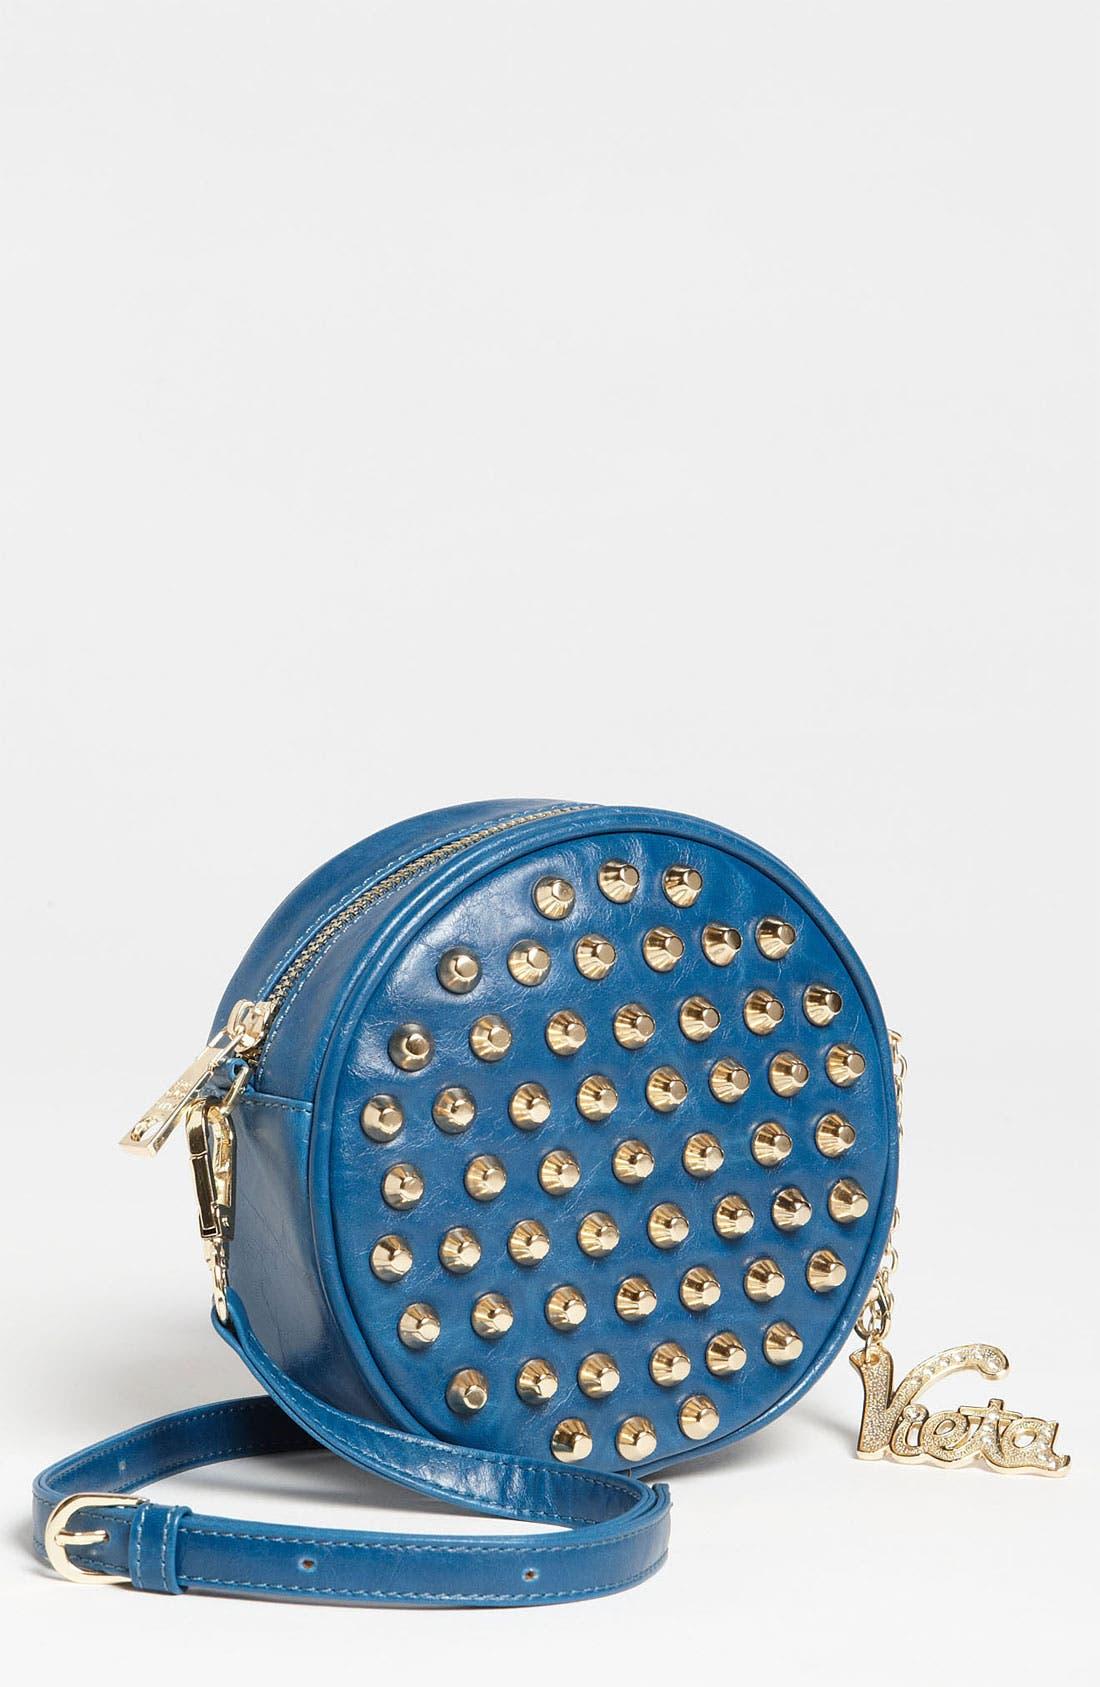 Alternate Image 1 Selected - Vieta 'Sikey' Crossbody Bag